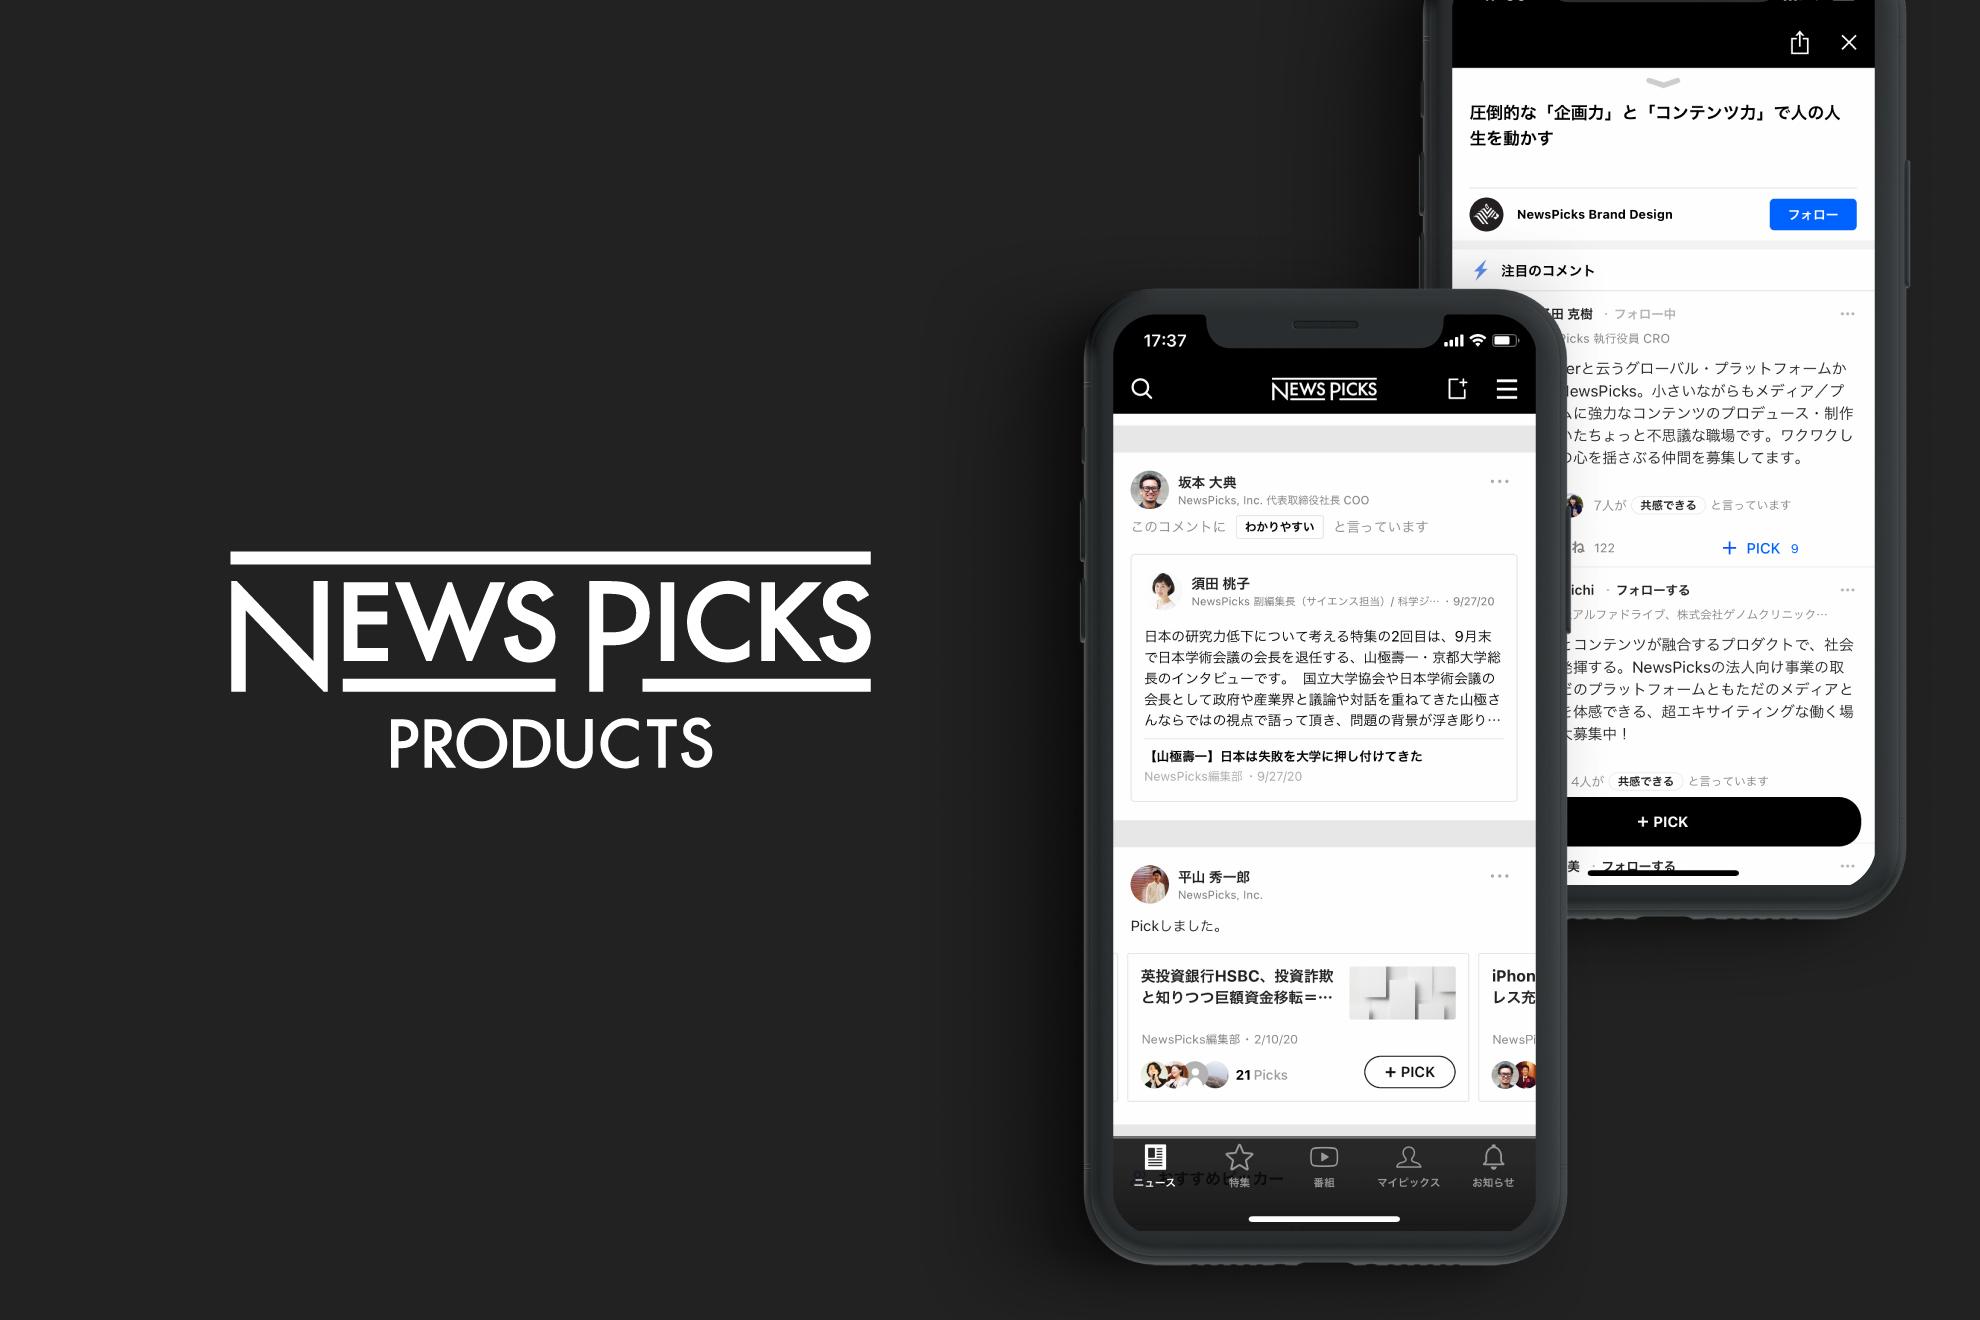 Picks news Marlins news: